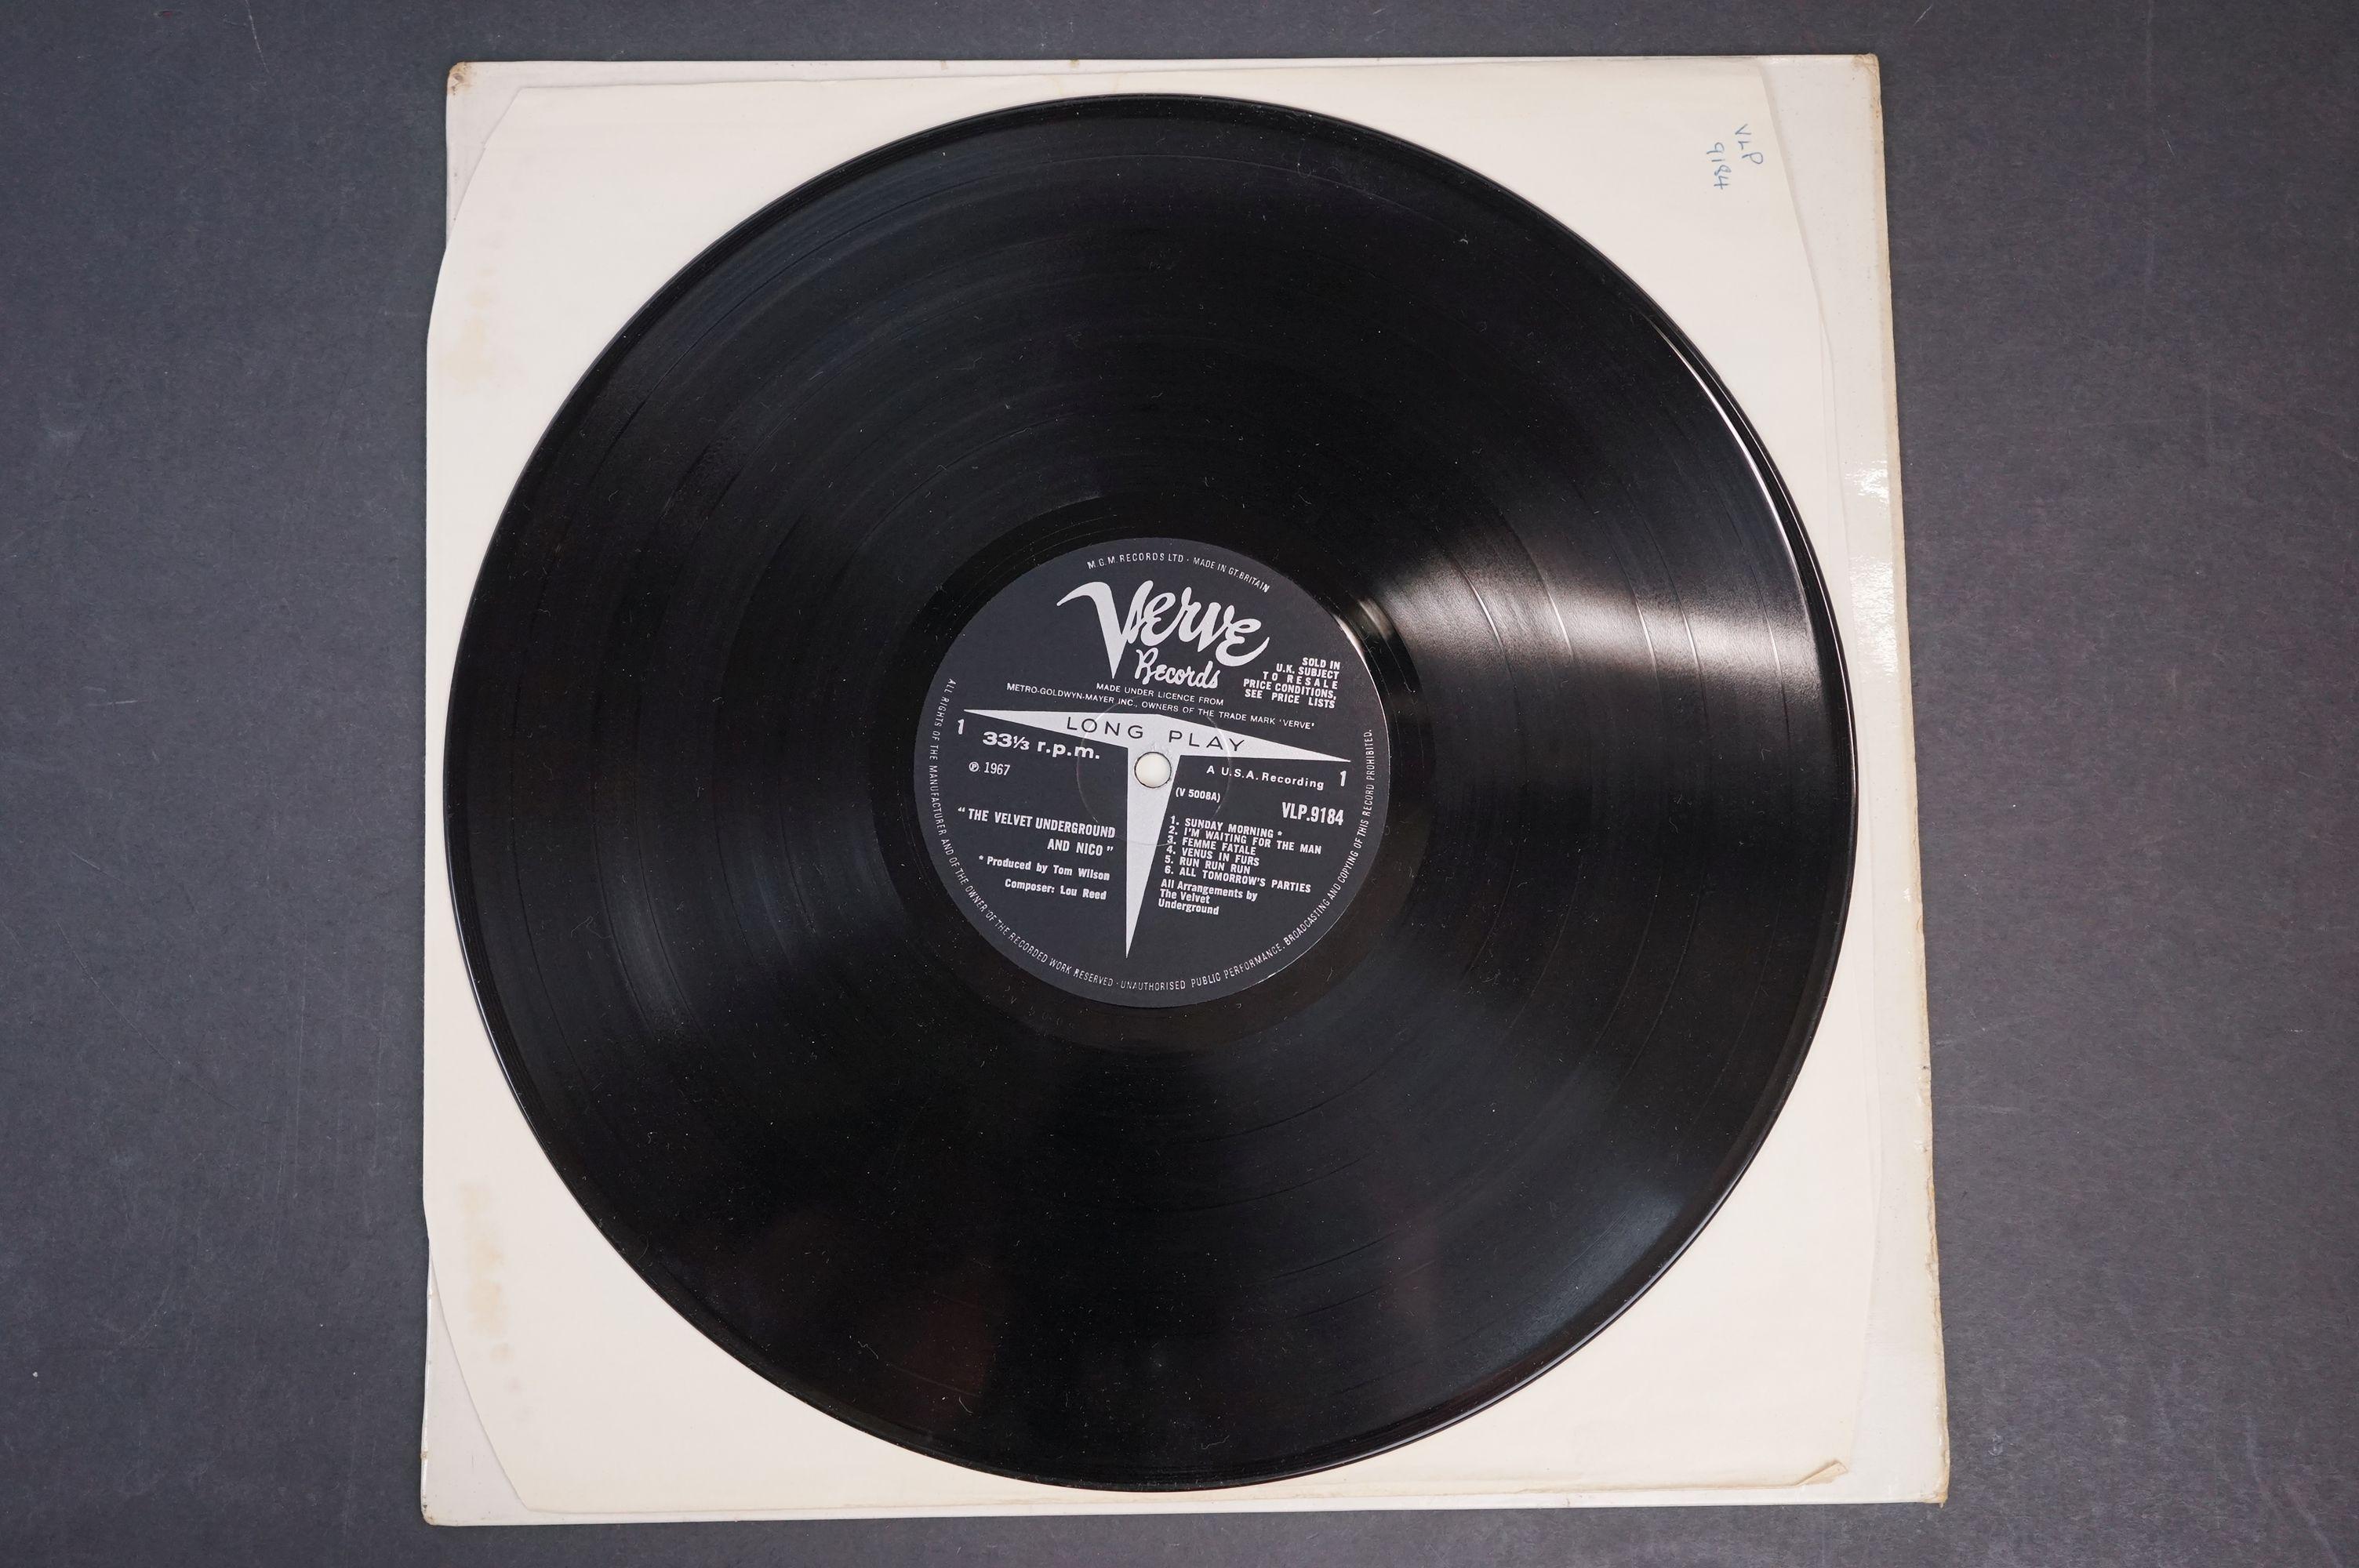 Vinyl - The Velvet Underground & Nico produced by Andy Warhol LP on Verve VLP9184 mono, non banana - Image 2 of 5